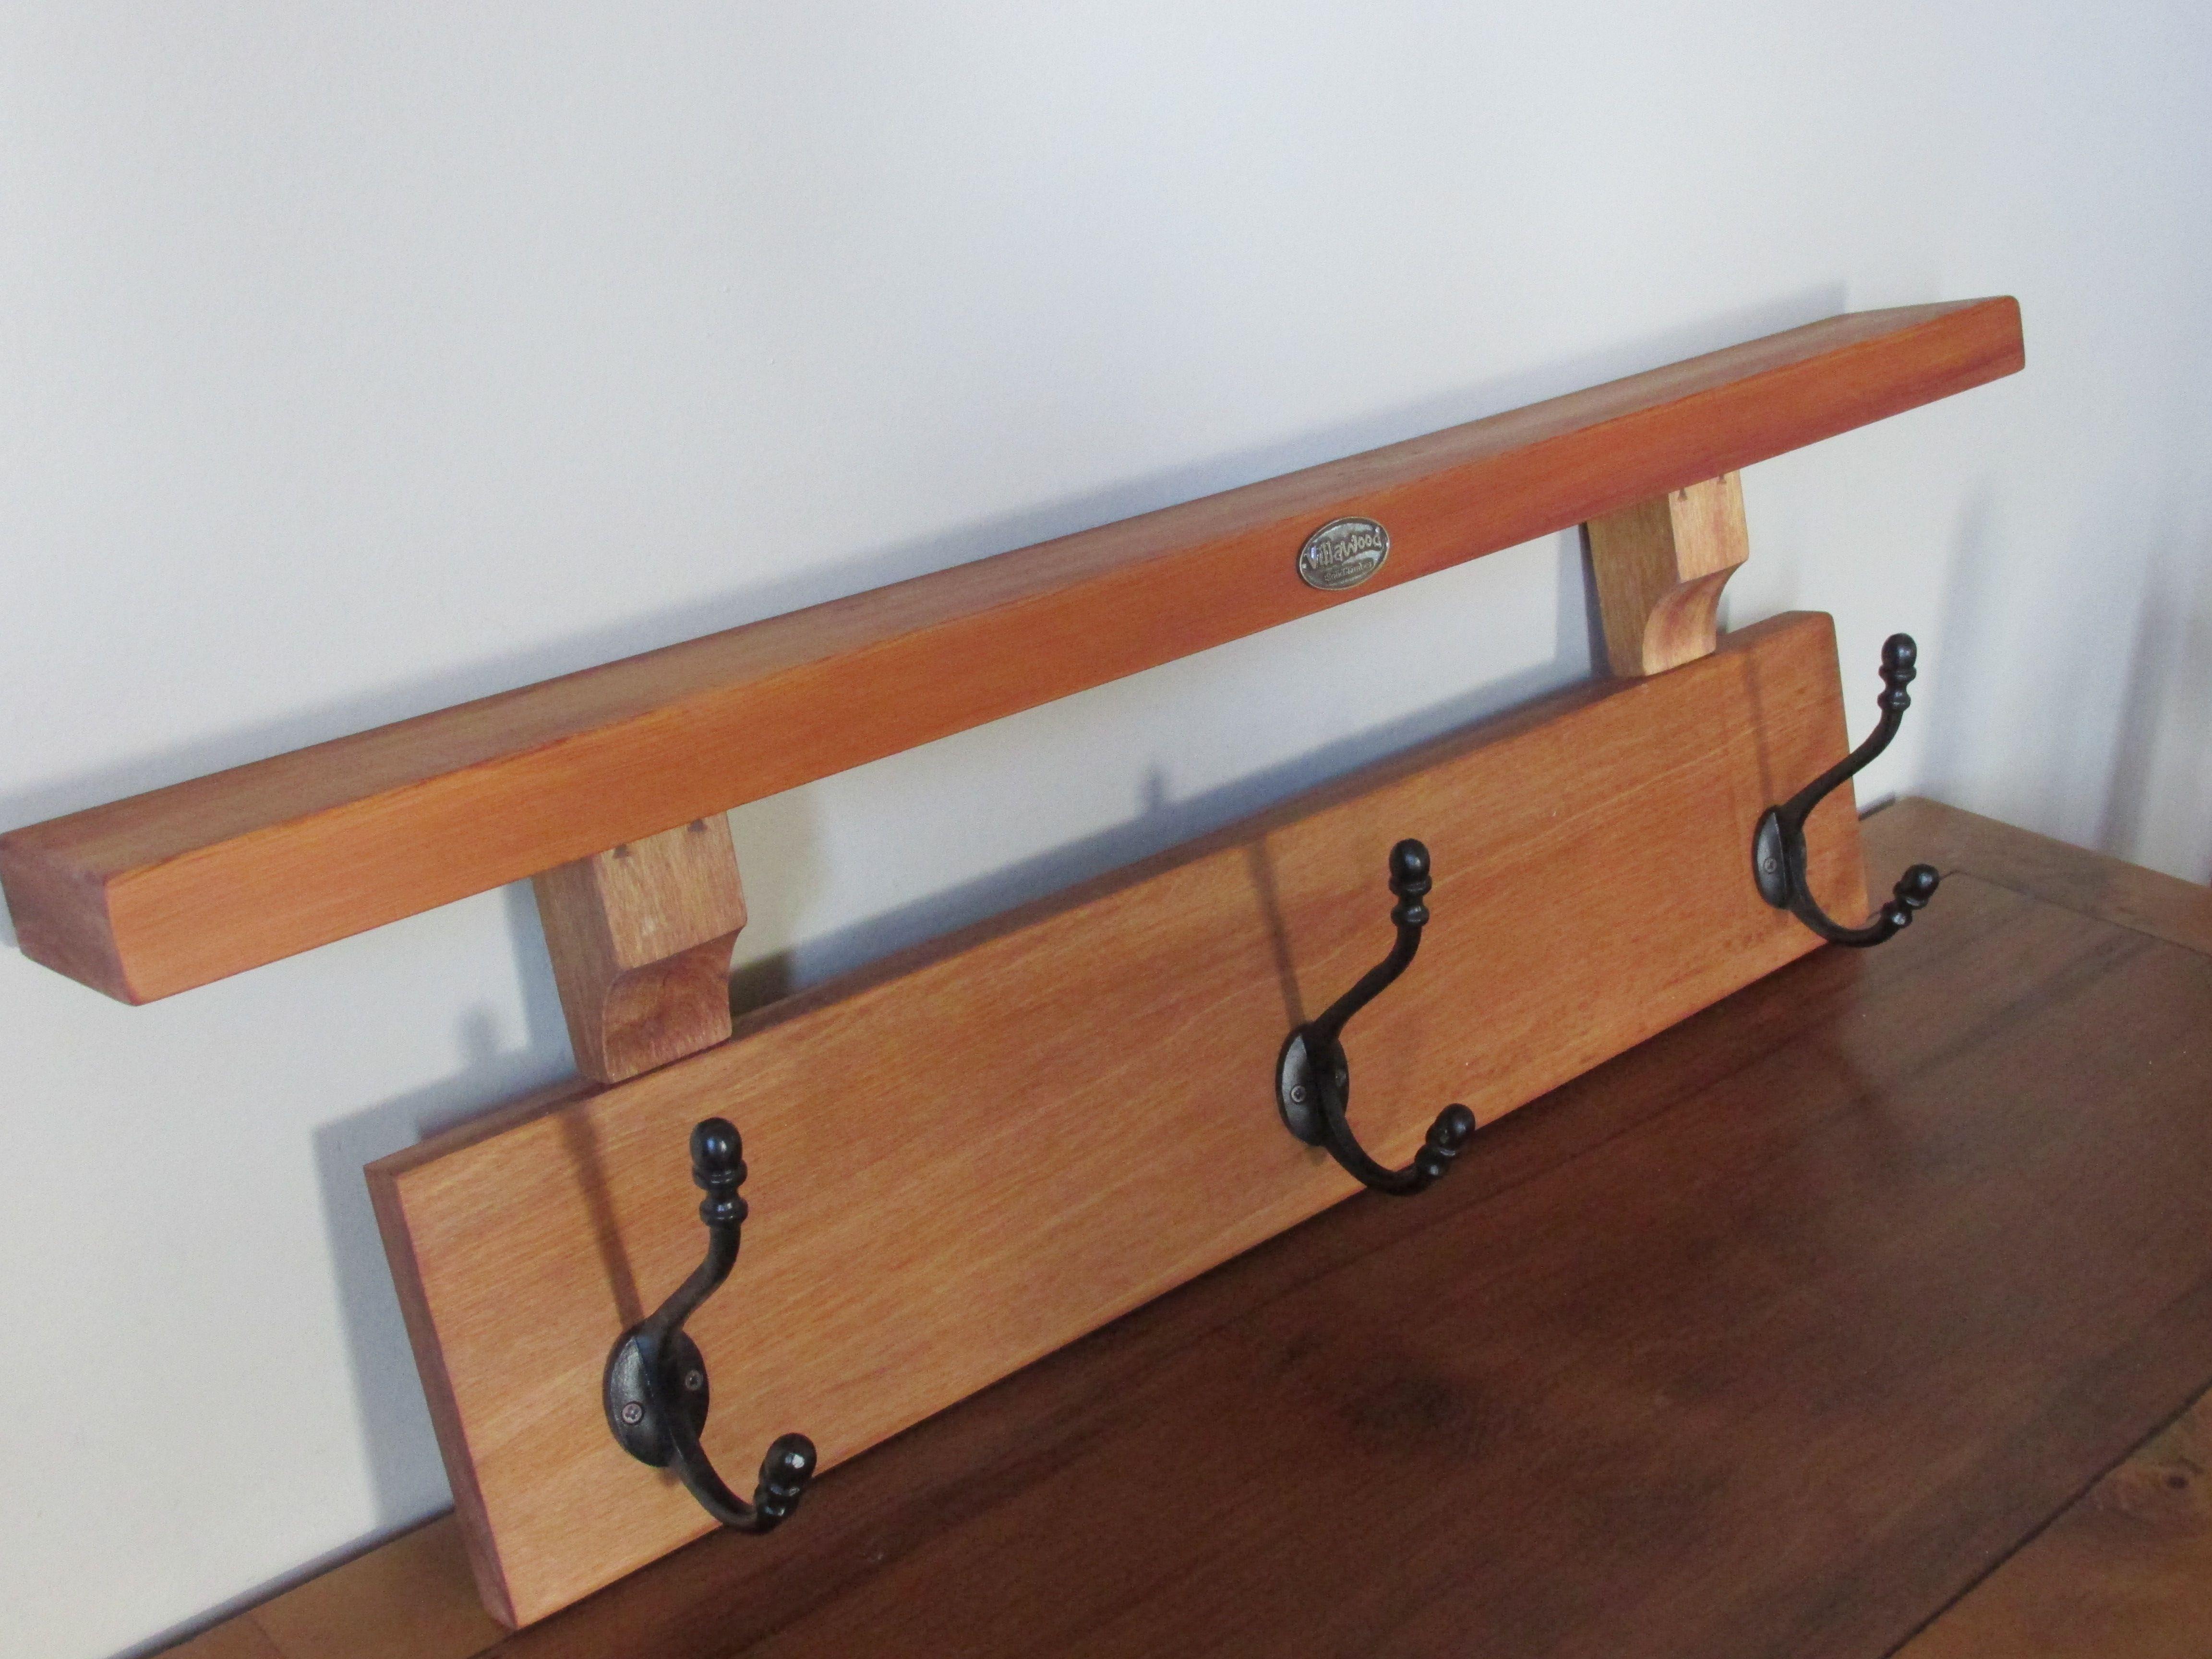 3 Hook Coat Rack With Shelf Solid Recycled Rimu 90 Https Www Facebook Com Villawoodcreations Diy Coat Rack Coat Rack Shelf Home Decor